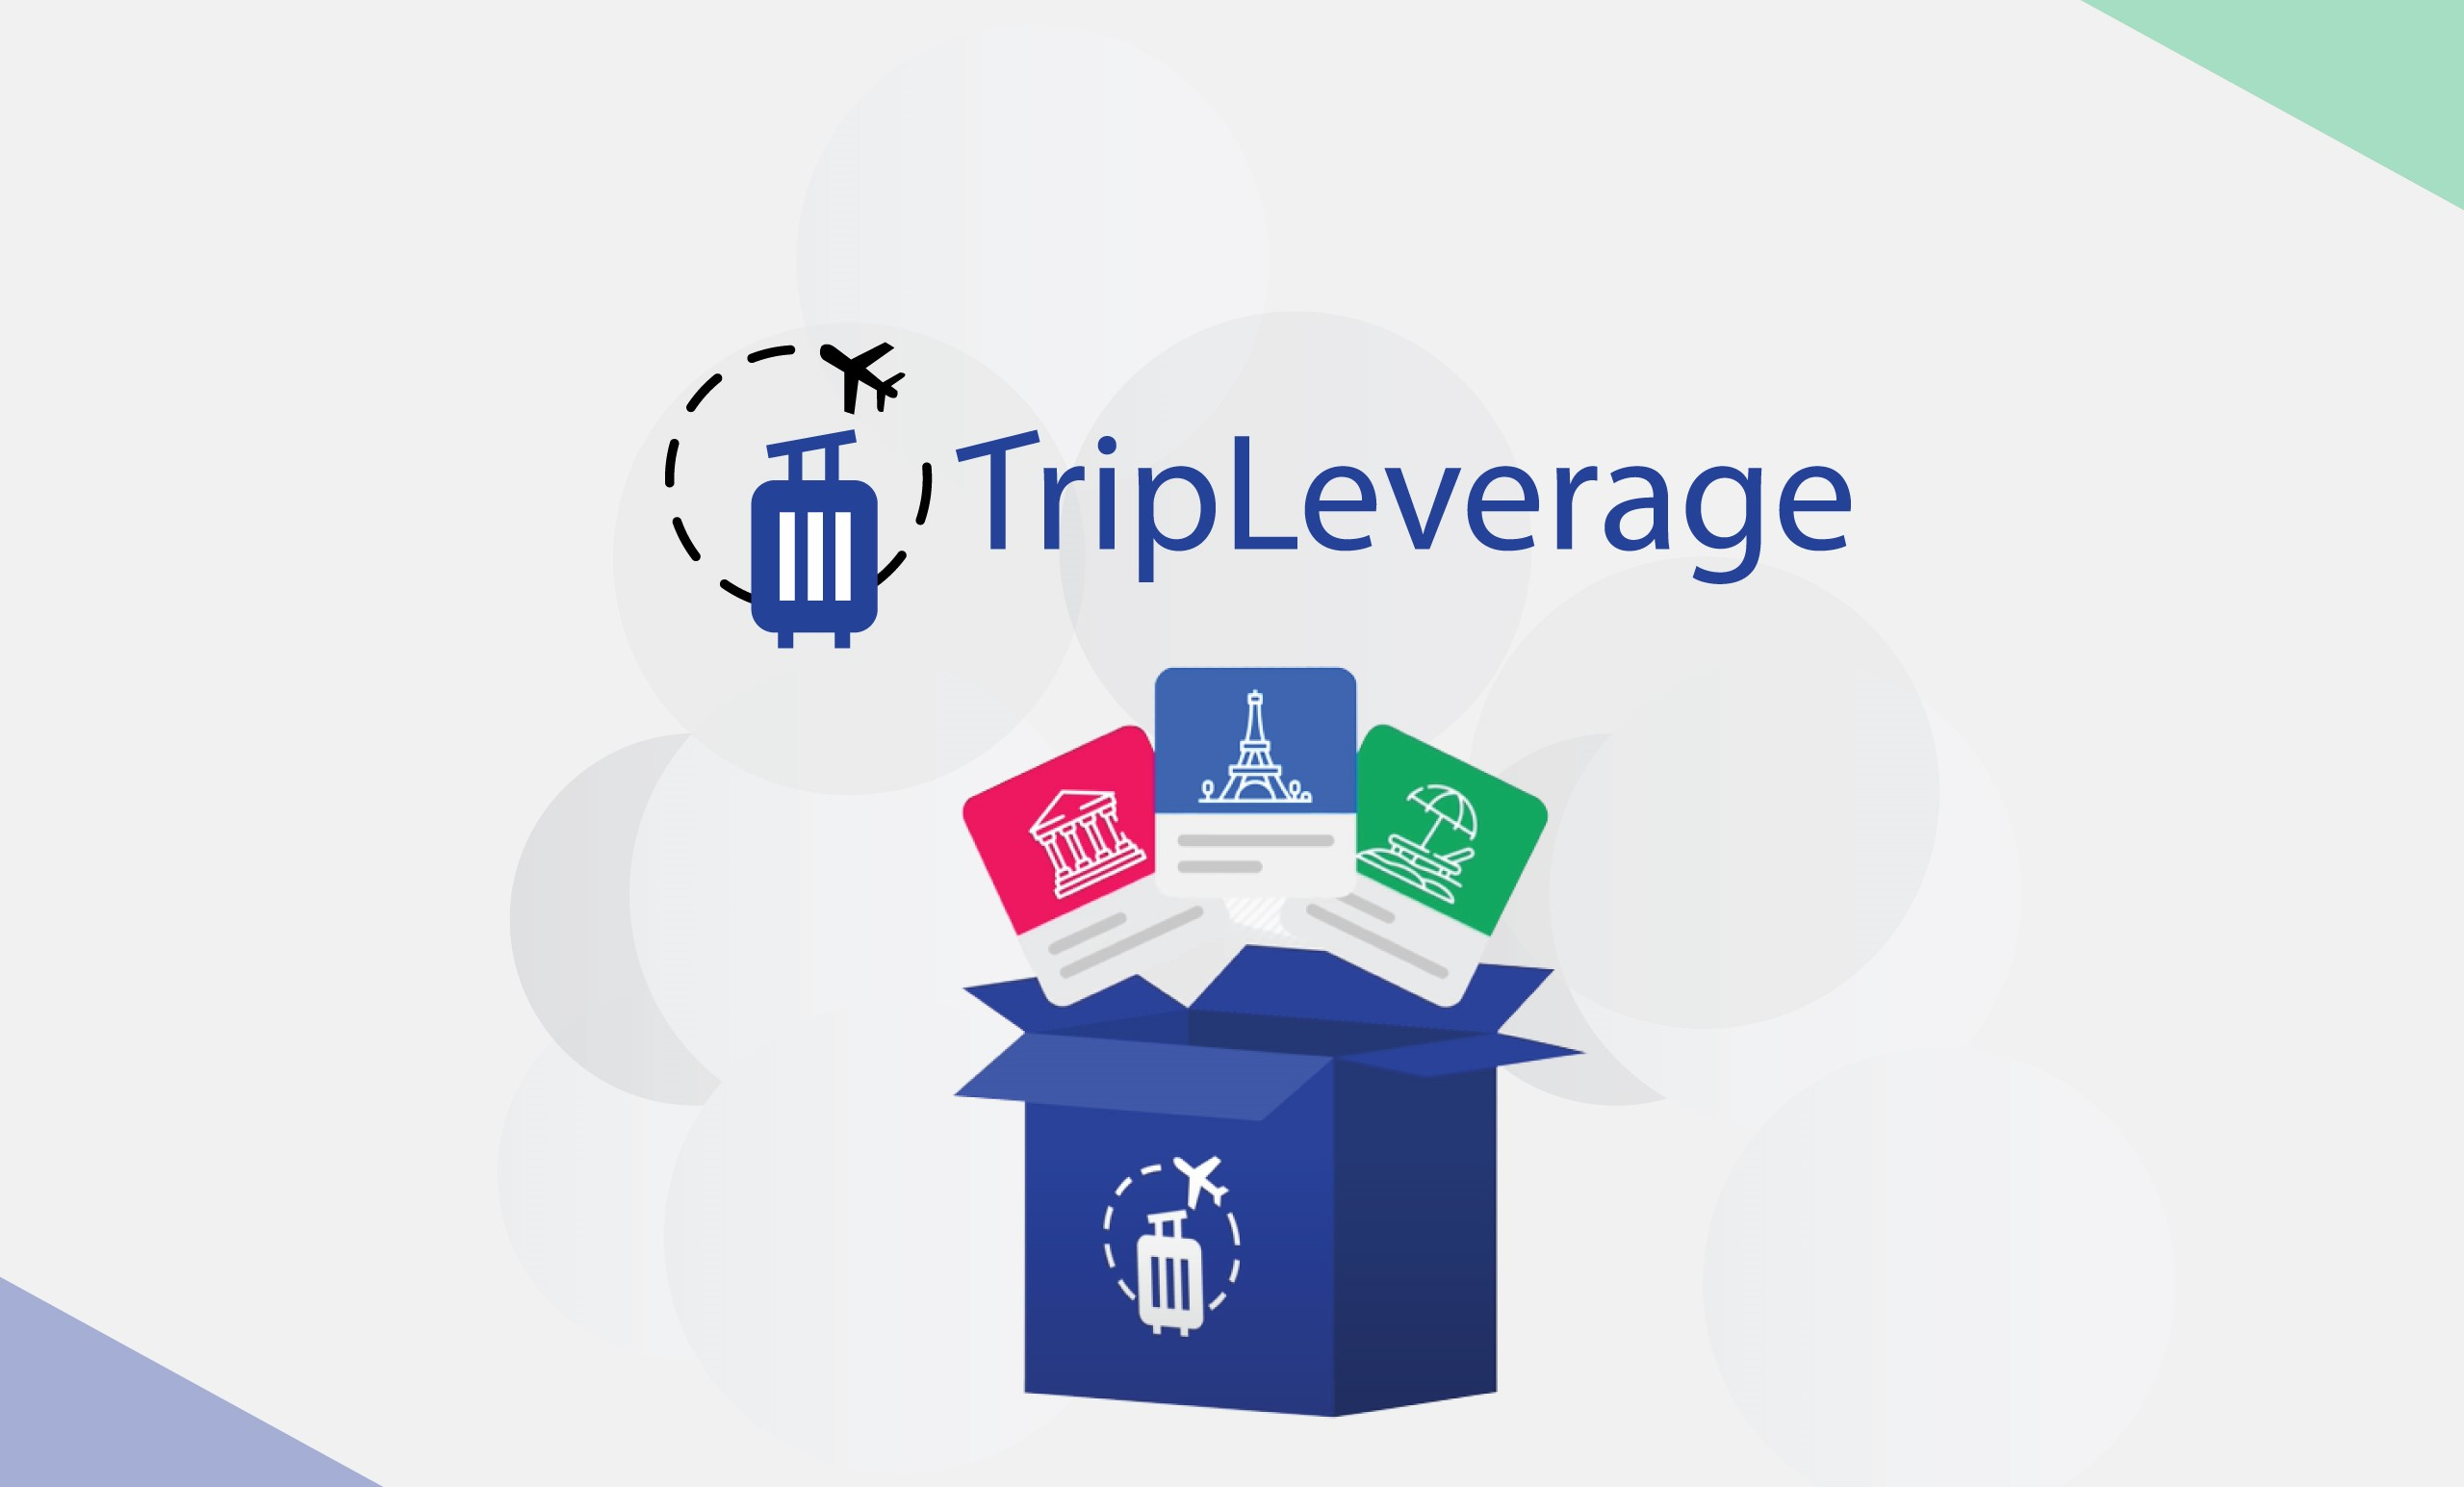 "TripLeverage"" loading=""lazy"" srcset=""https://coindoo.com/wp-content/uploads/2021/08/TripLeverage.jpg 2560w, https://coindoo.com/wp-content/uploads/2021/08 /TripLeverage-300x181.jpg 300w, https://coindoo.com/wp-content/uploads/2021/08/TripLeverage-1024x618.jpg 1024w, https://coindoo.com/wp-content/uploads/2021/08 /TripLeverage-768x464.jpg 768w, https://coindoo.com/wp-content/uploads/2021/08/TripLeverage-1536x927.jpg 1536w, https://coindoo.com/wp-content/uploads/2021/08 /TripLeverage-2048x1236.jpg 2048w"" dimension=""(max-width: 2560px) 100vw, 2560px""/></figure> <p>Platform perjalanan bisnis perintis, <a href="